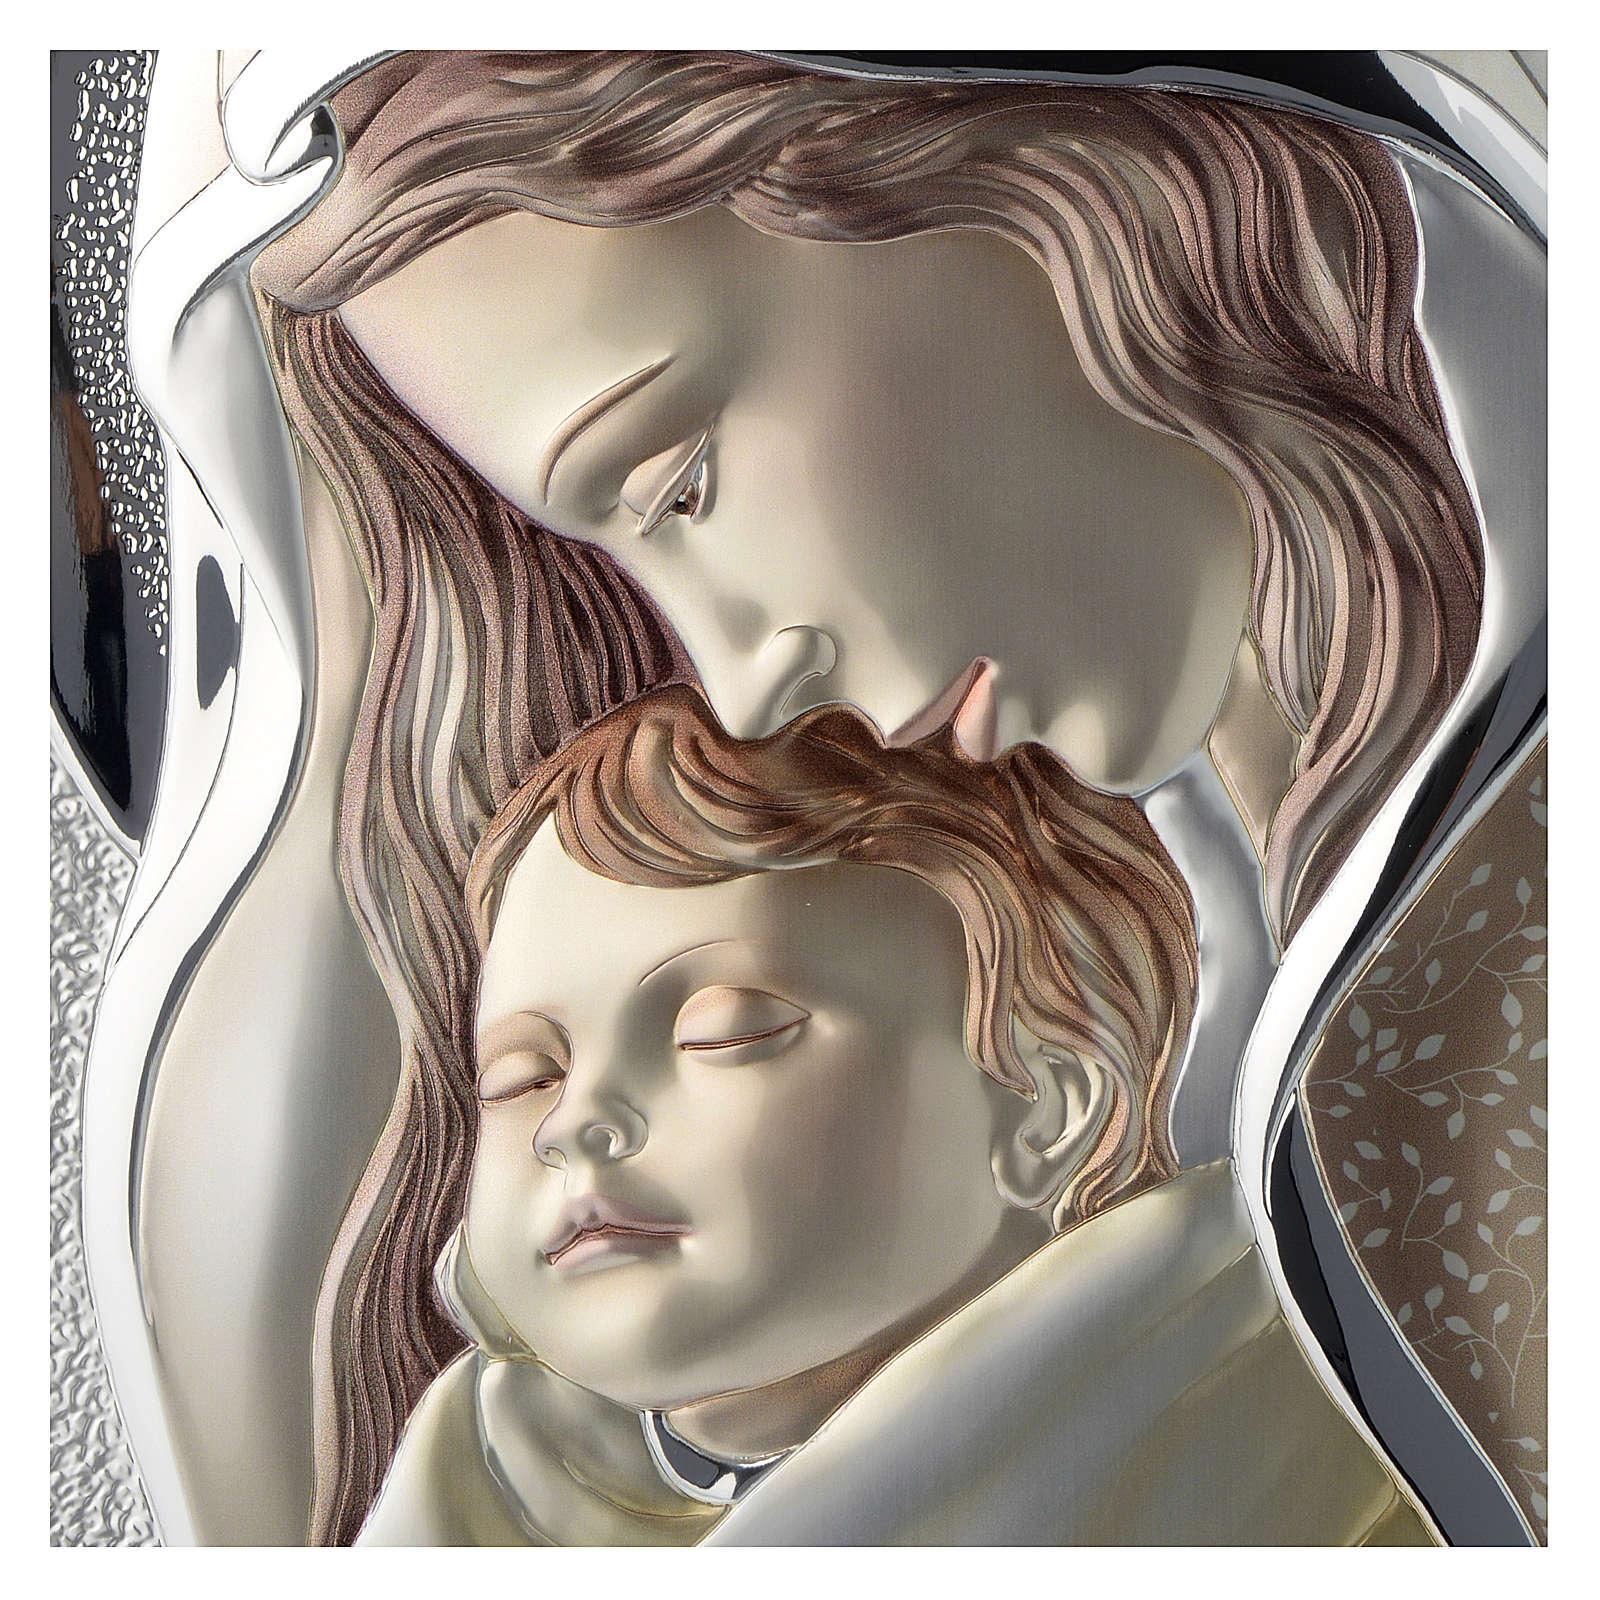 Cuadro Virgen con Niño plata coloreada madera 3